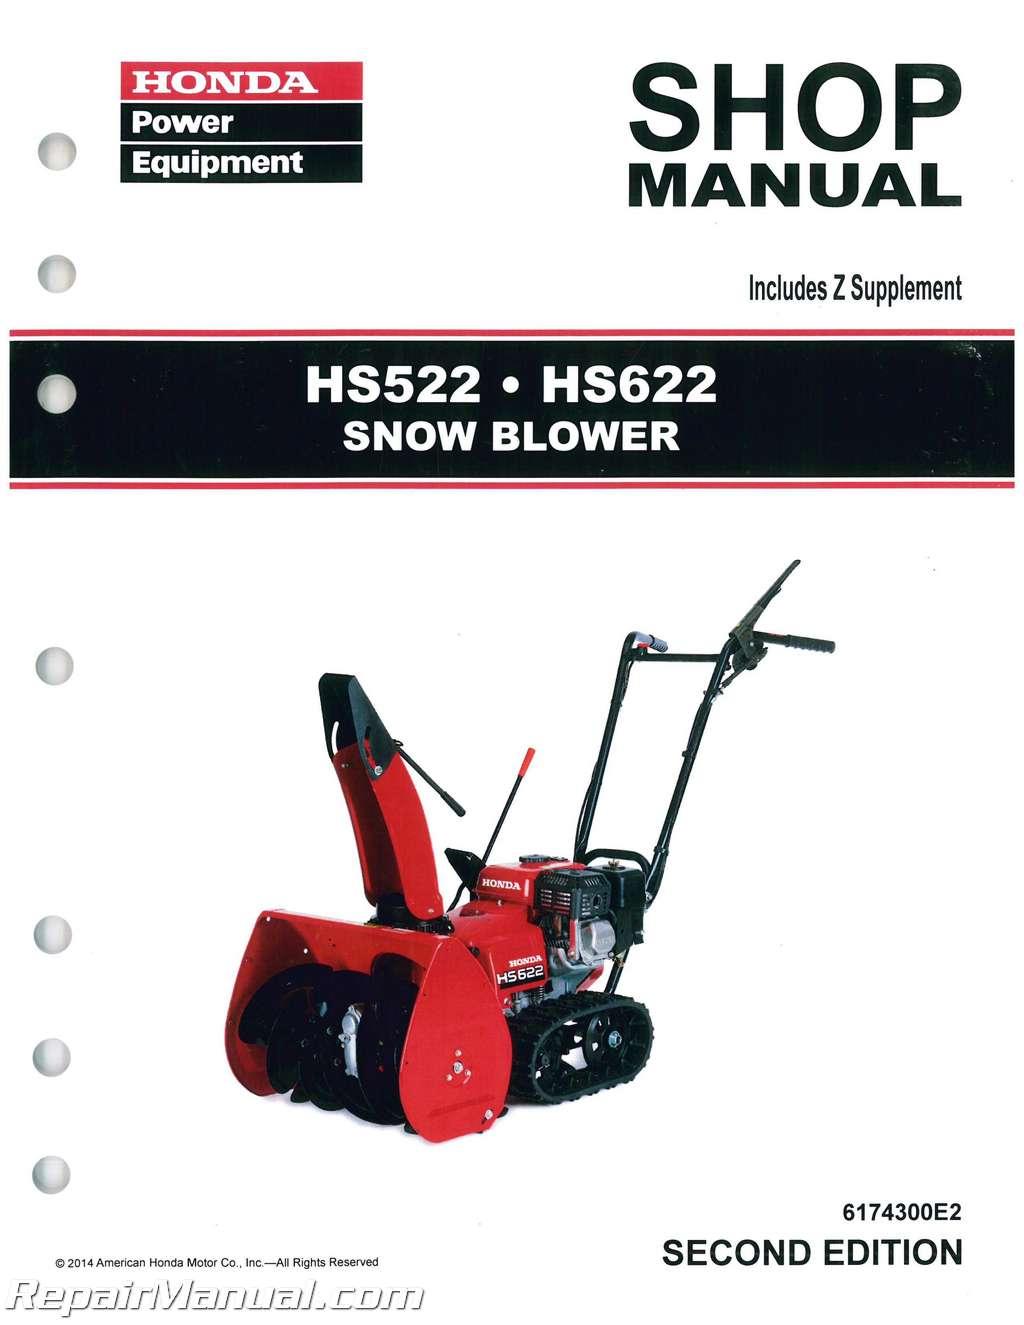 honda snowblower snow track drive snowblowers of blowers the image inch